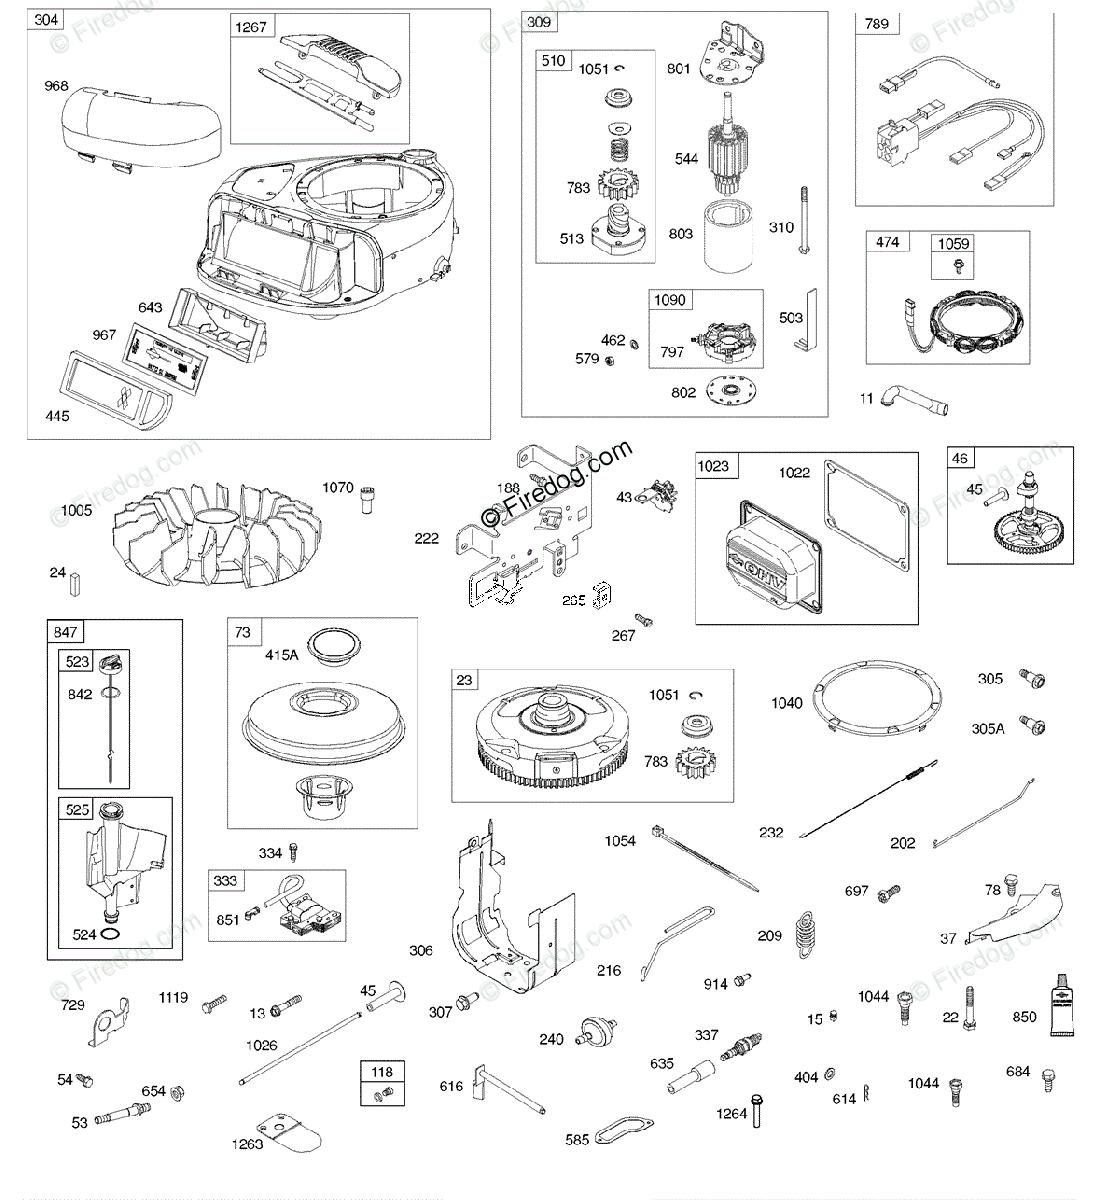 hight resolution of wiring diagram 125 lth wiring diagram img husqvarna ride mower lth 18538 917 289600